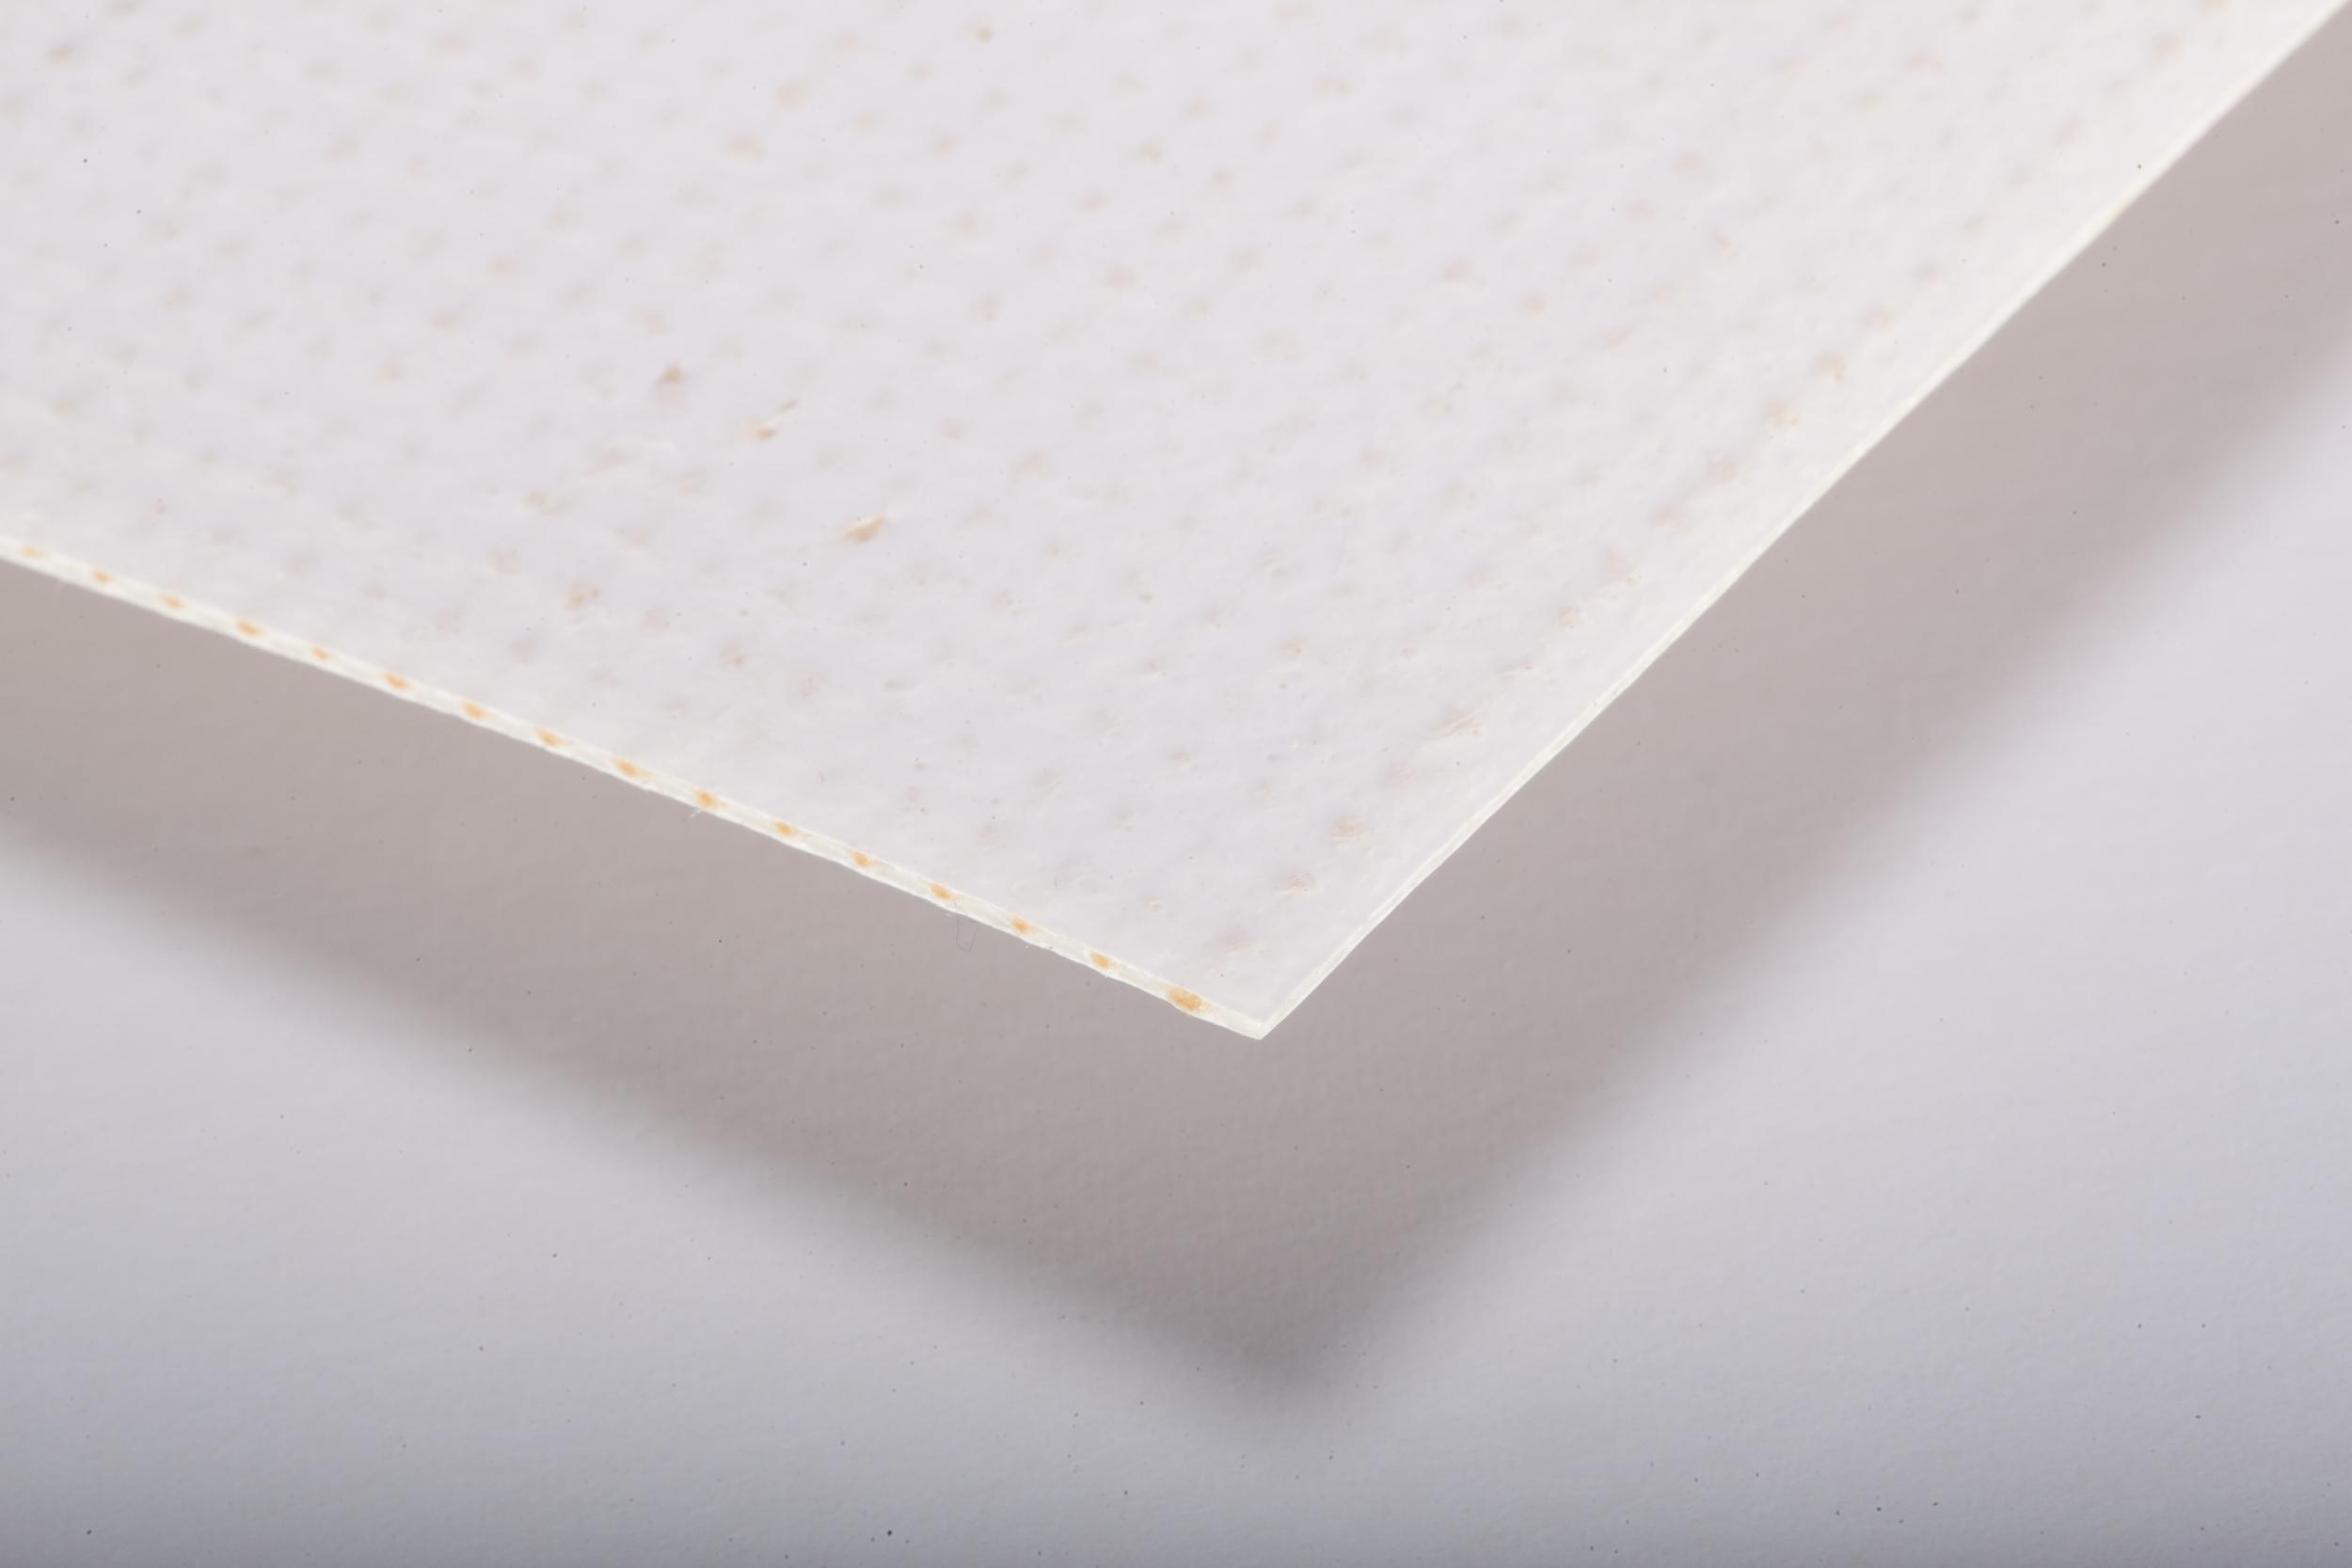 mm product reshoot-103.jpg